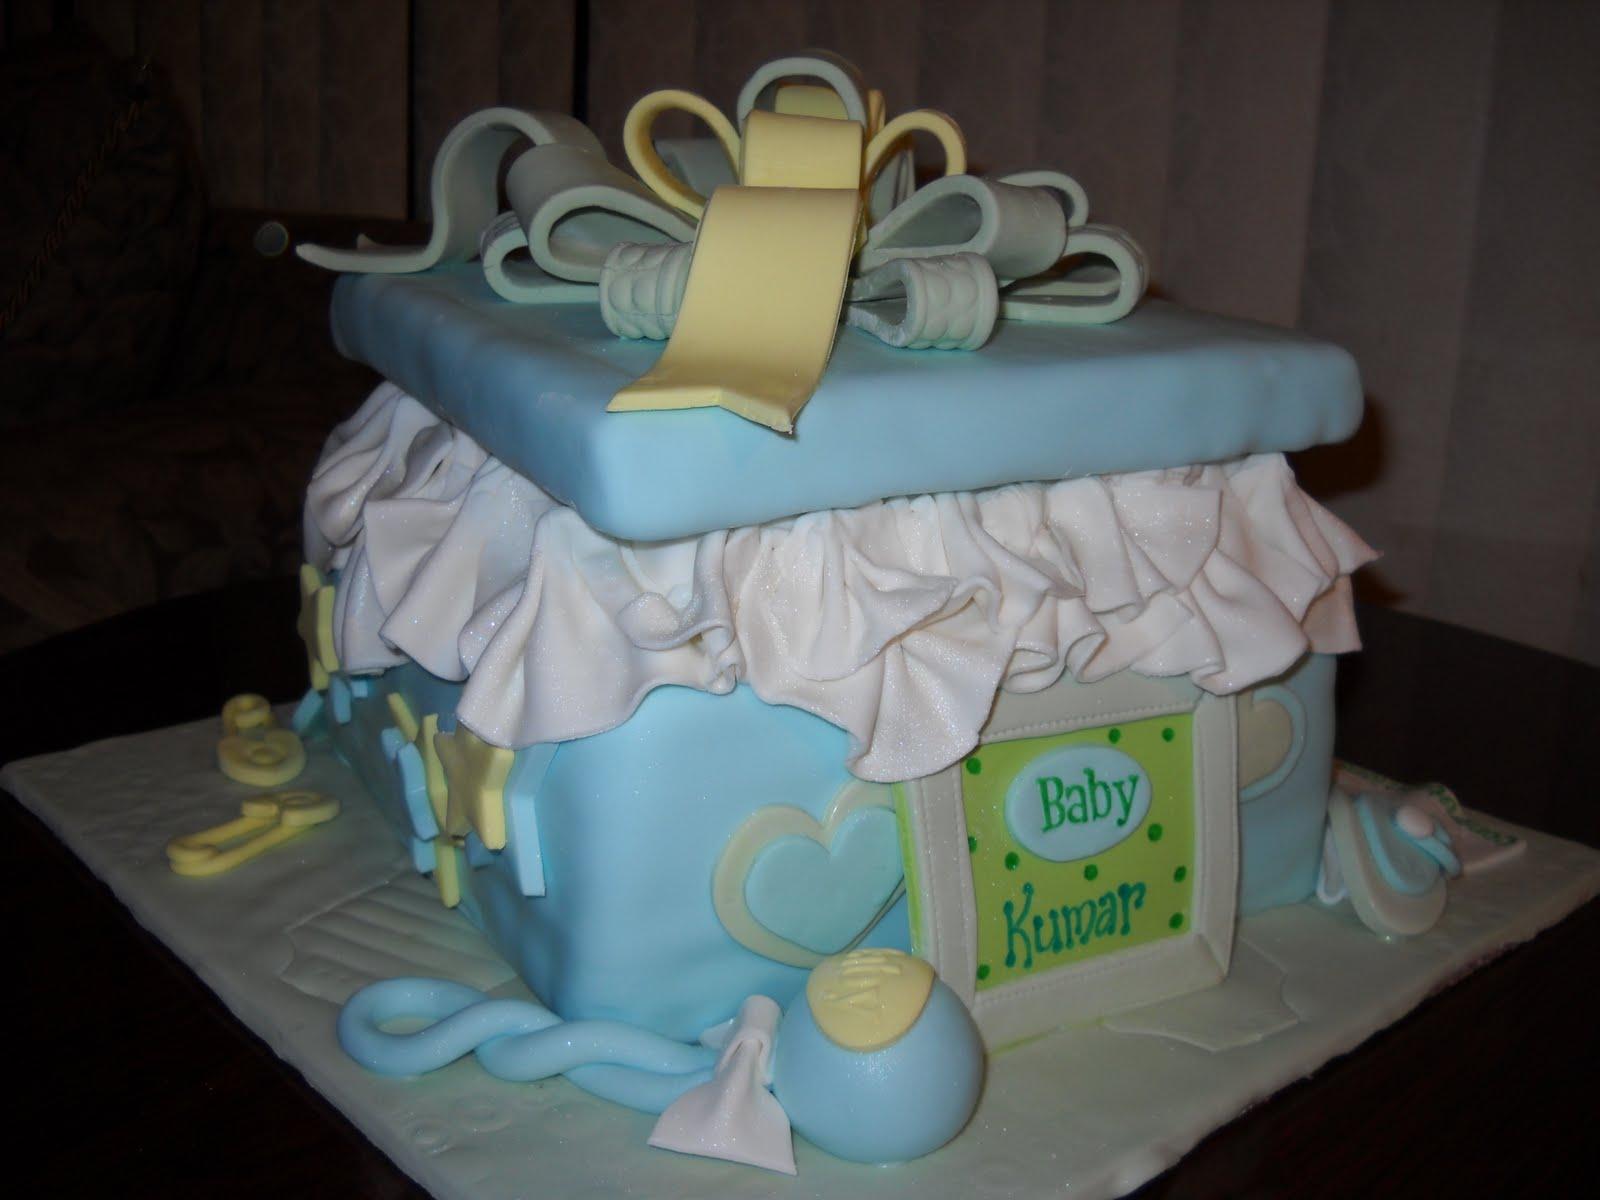 Tara S Piece Of Cake Present Babyshower Cake